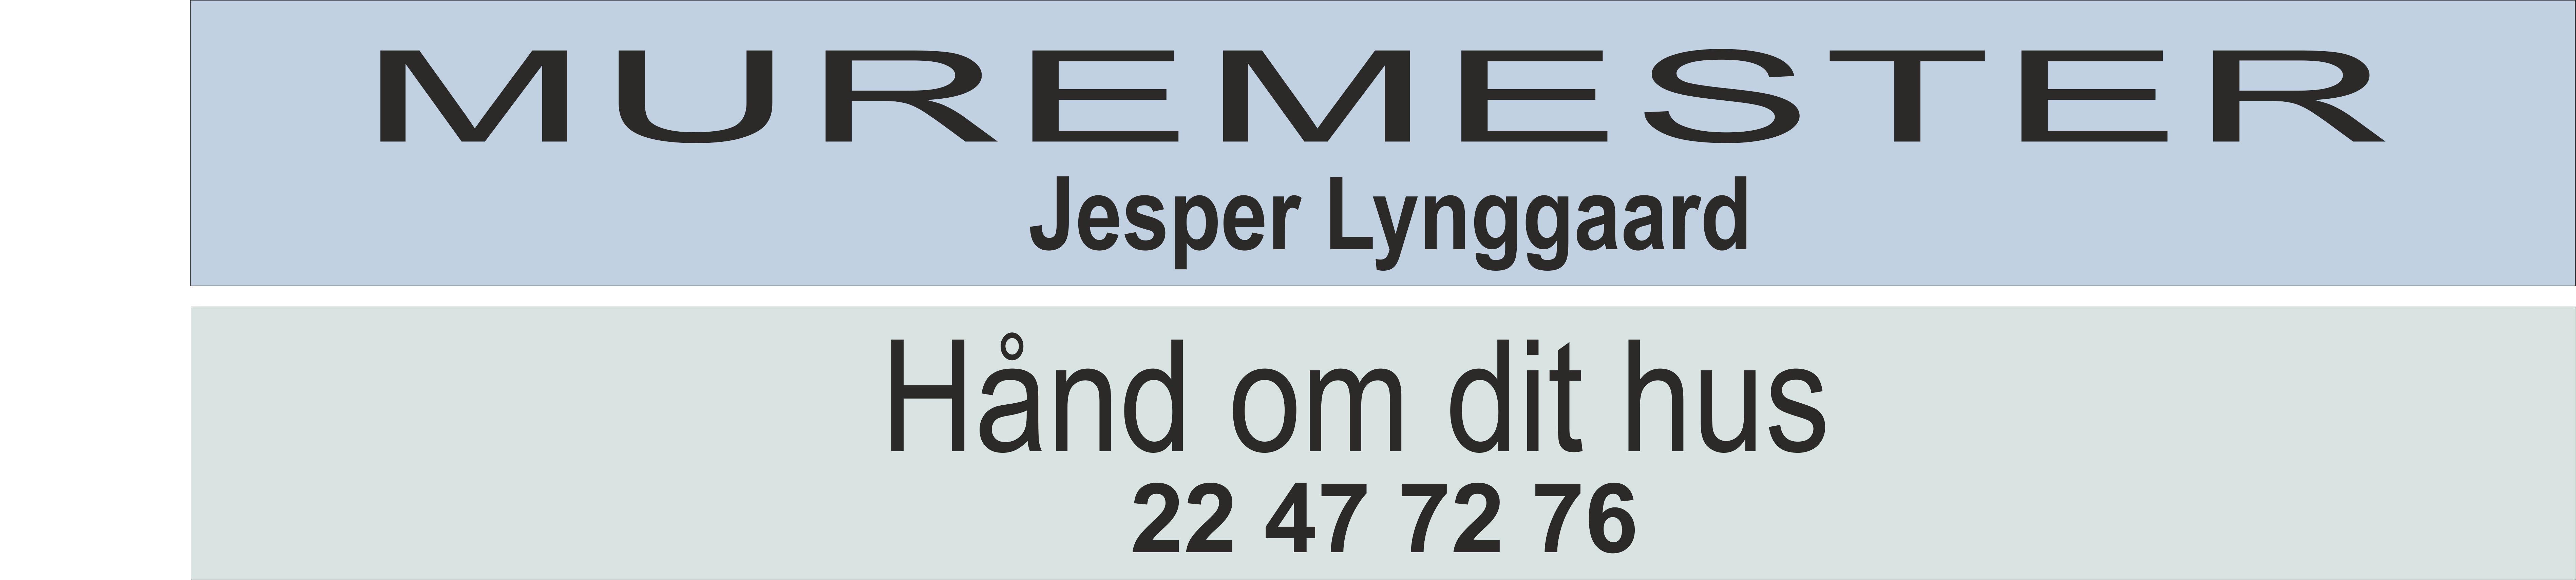 Murermester Jesper Lynggaard